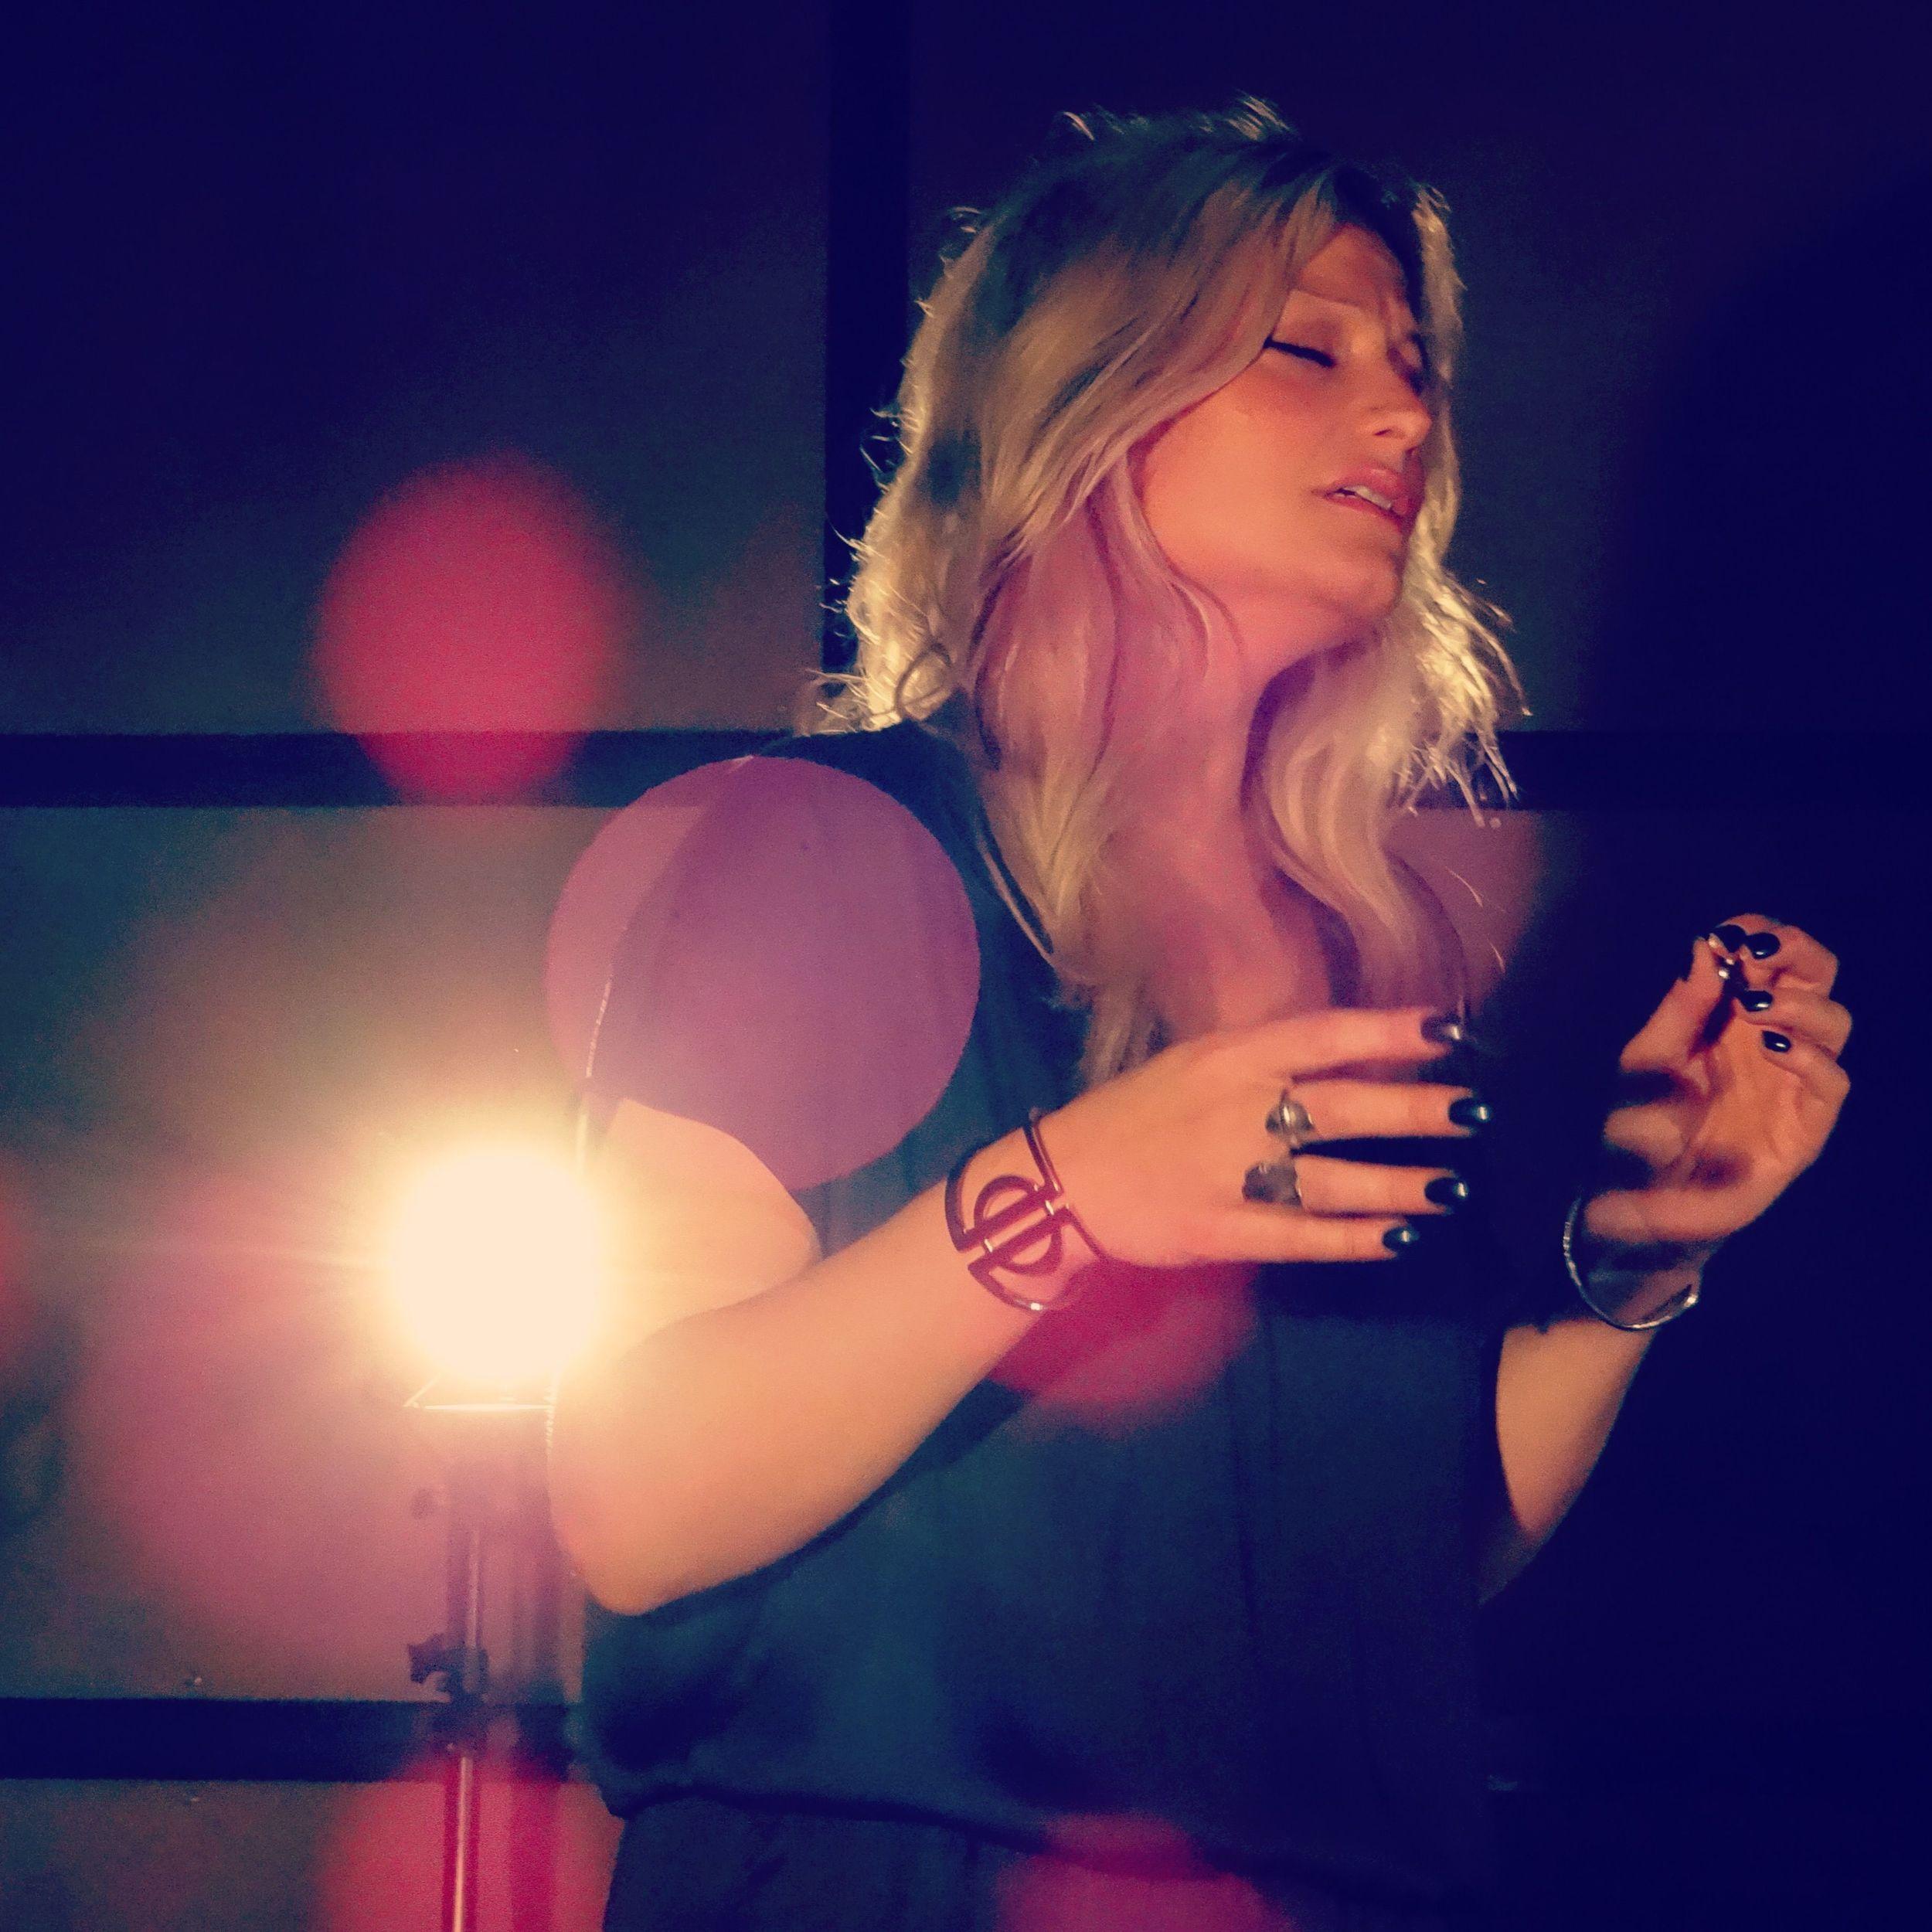 Bex filming her acoustic demo